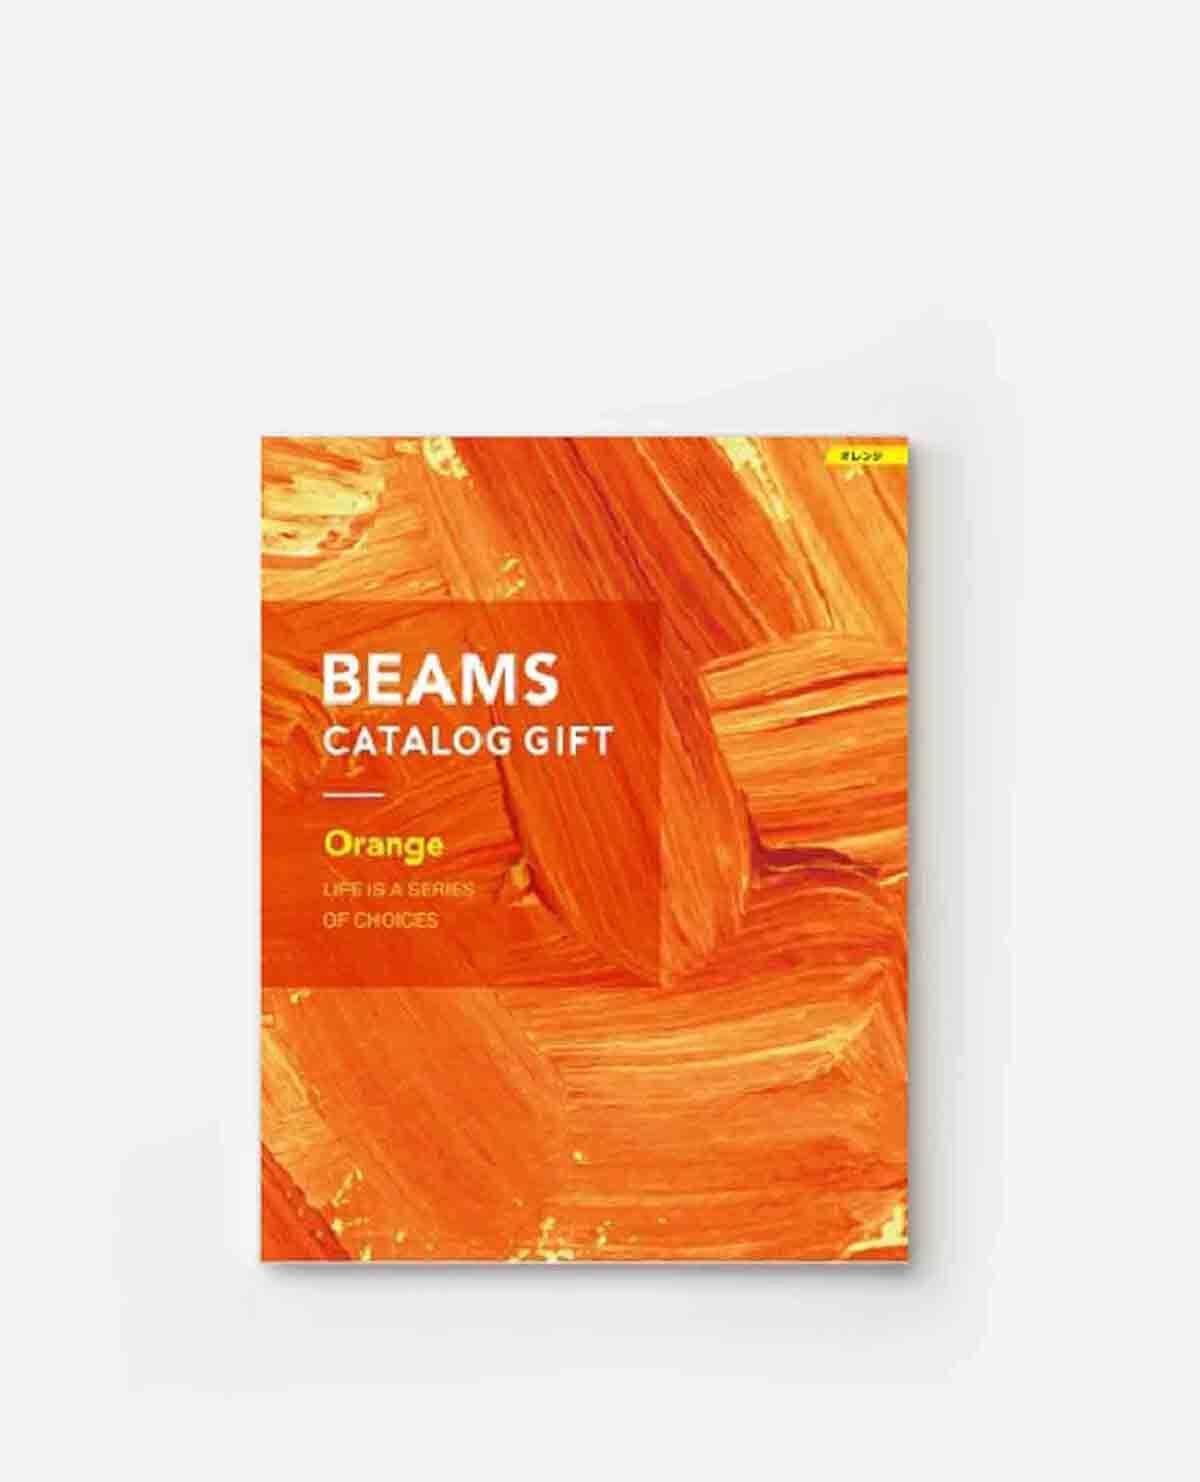 BEAMS CATALOG GIFT Orange